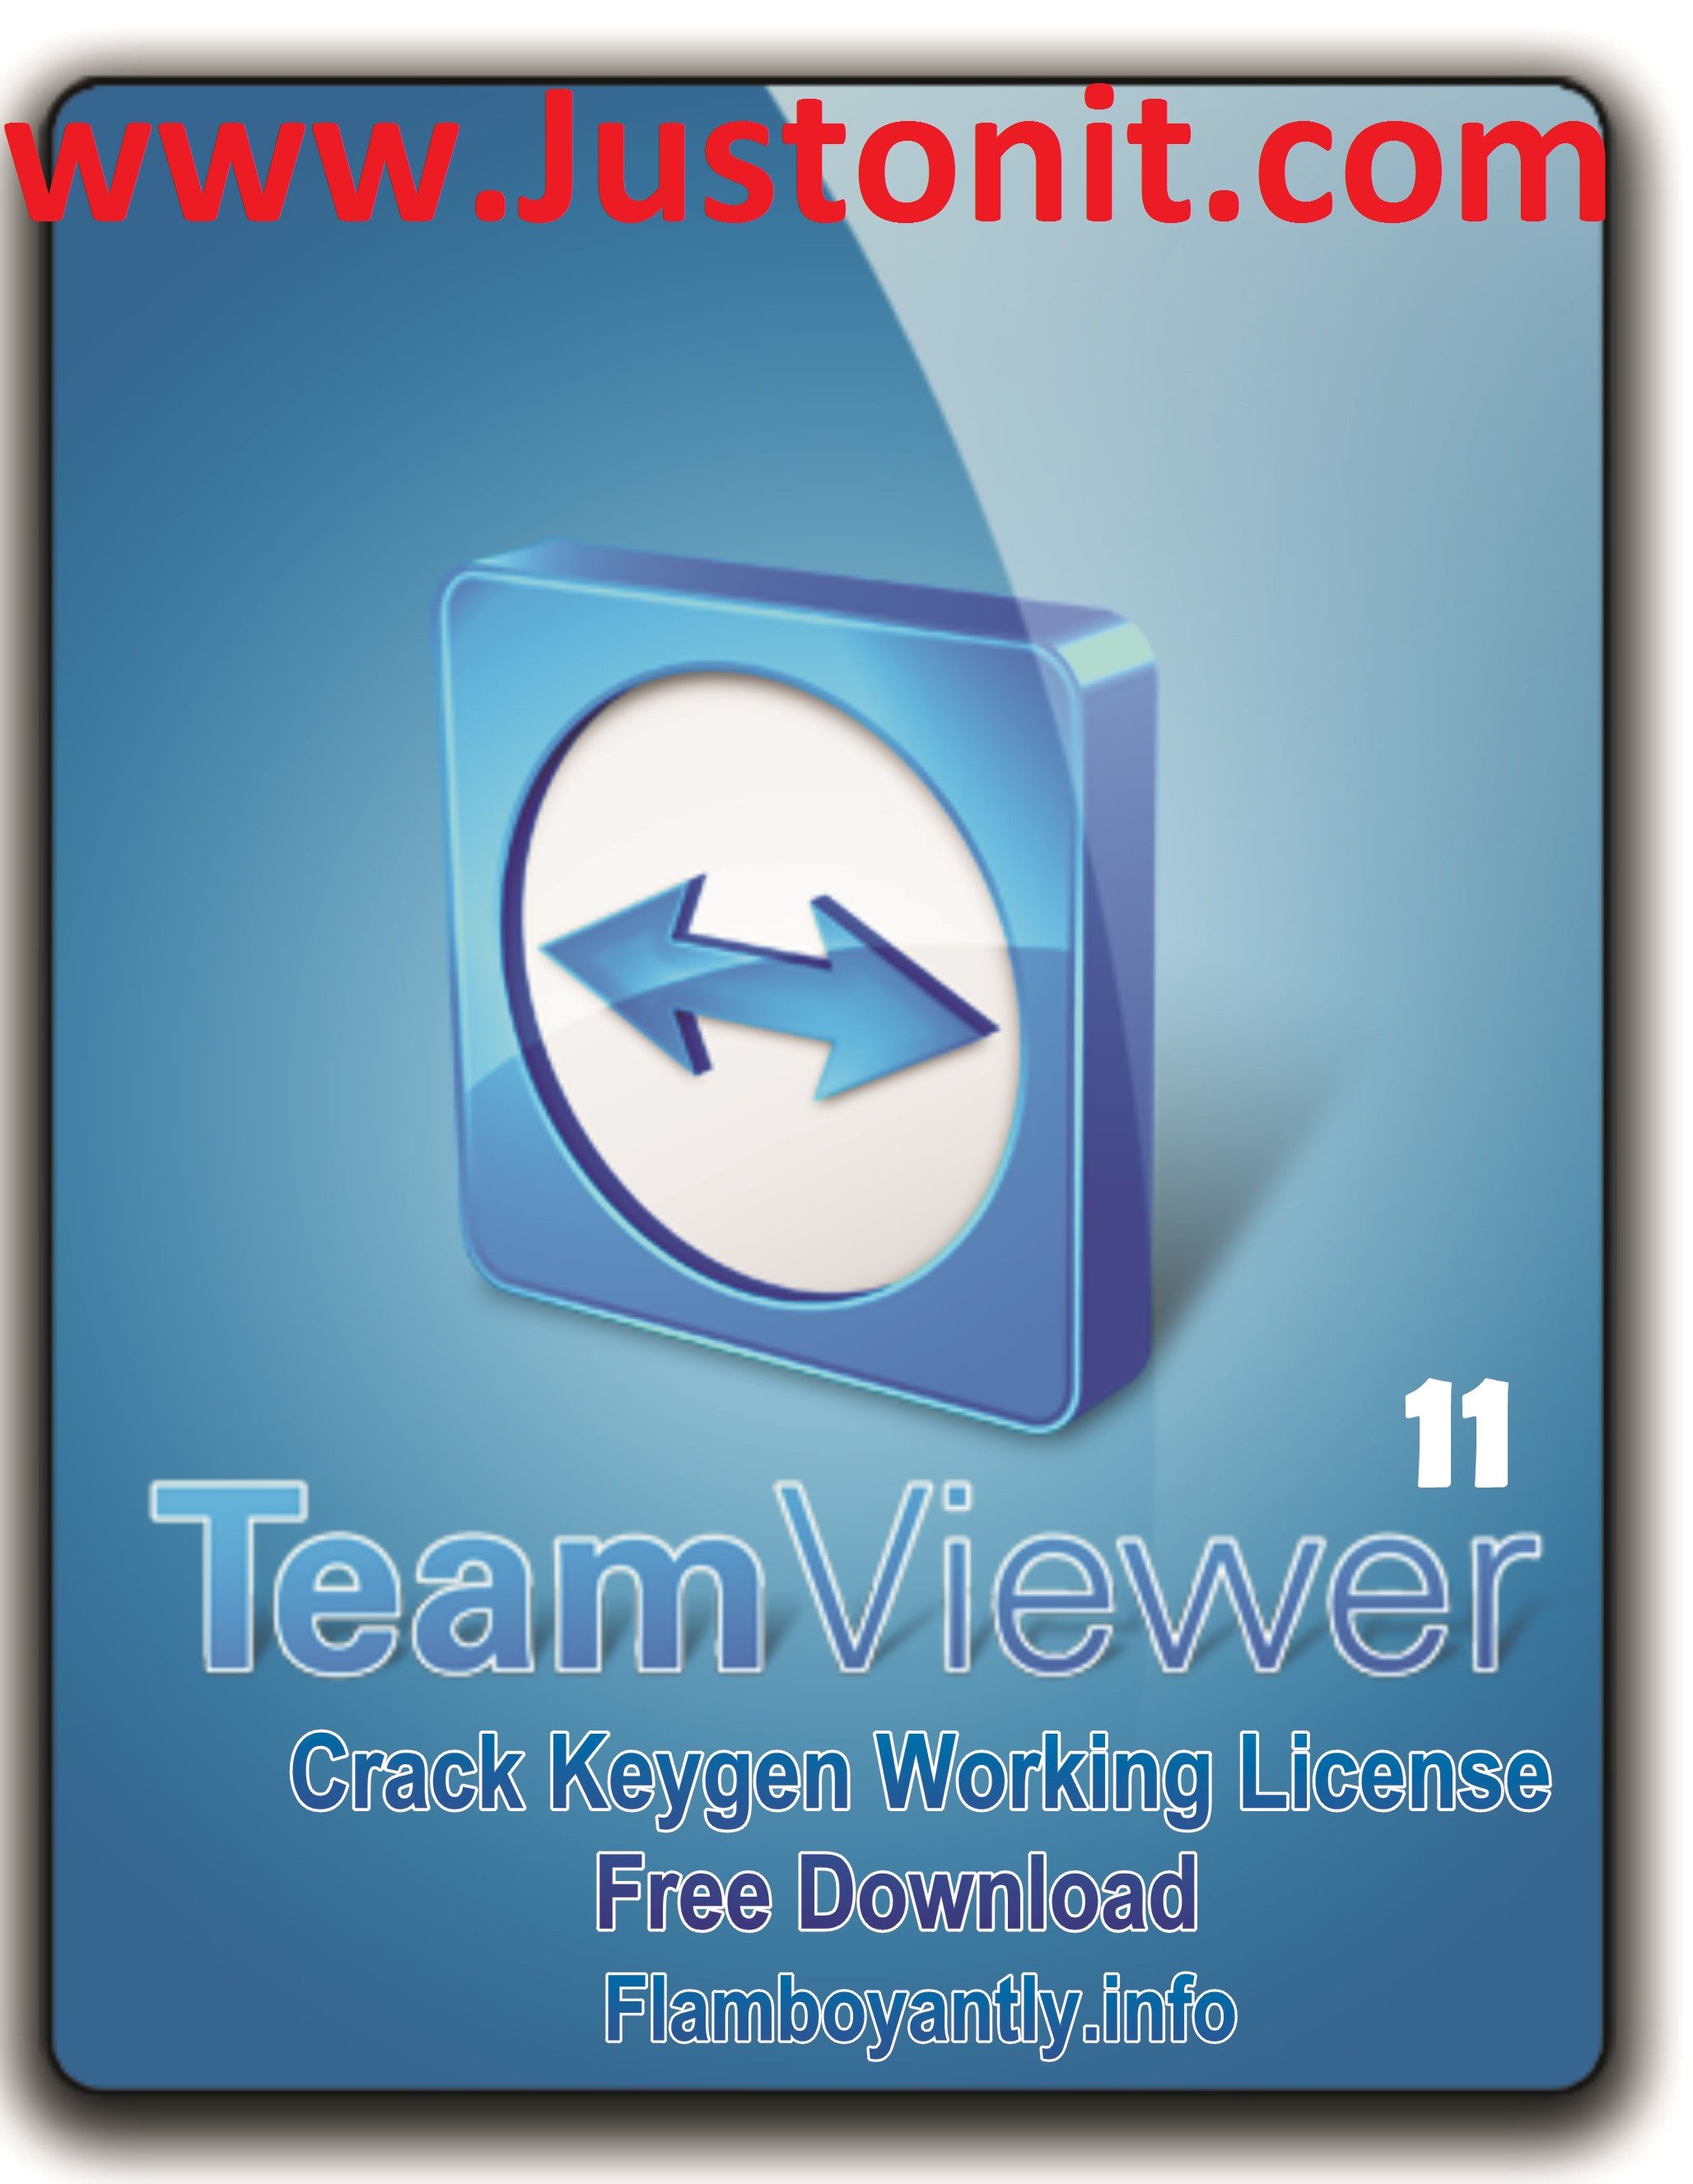 download teamviewer latest version free